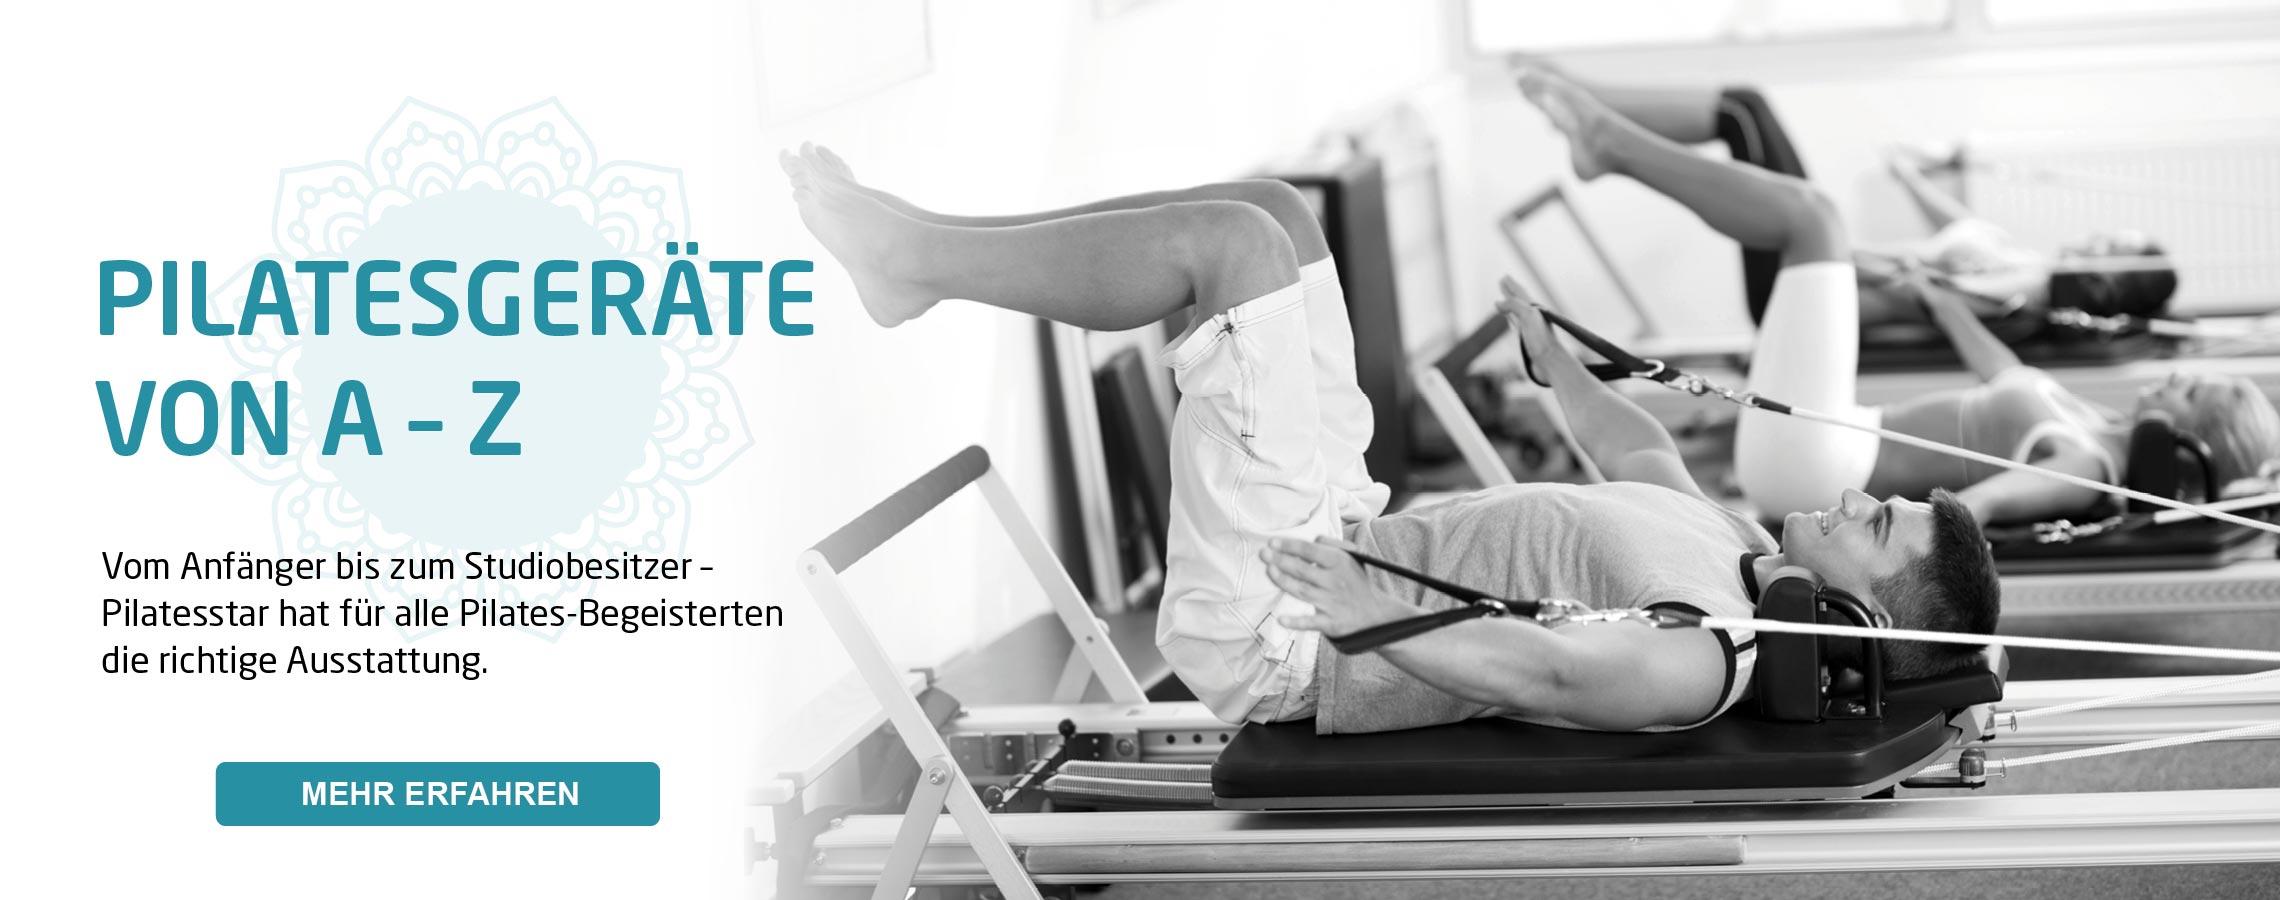 Startseite Teaser Pilates